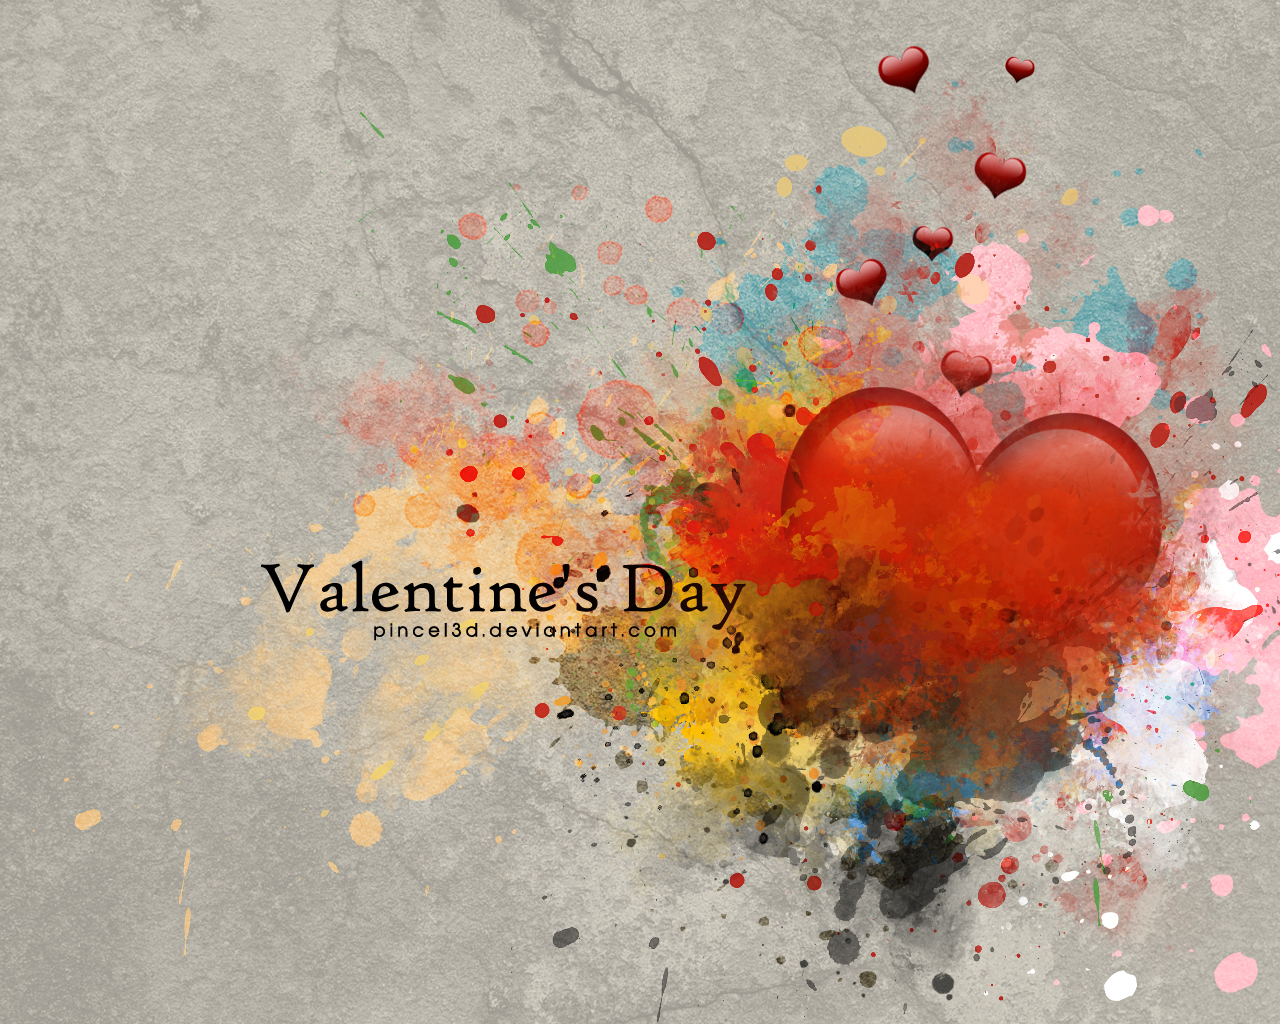 http://fc02.deviantart.net/fs26/f/2008/041/b/1/Valentines_by_pincel3d.jpg